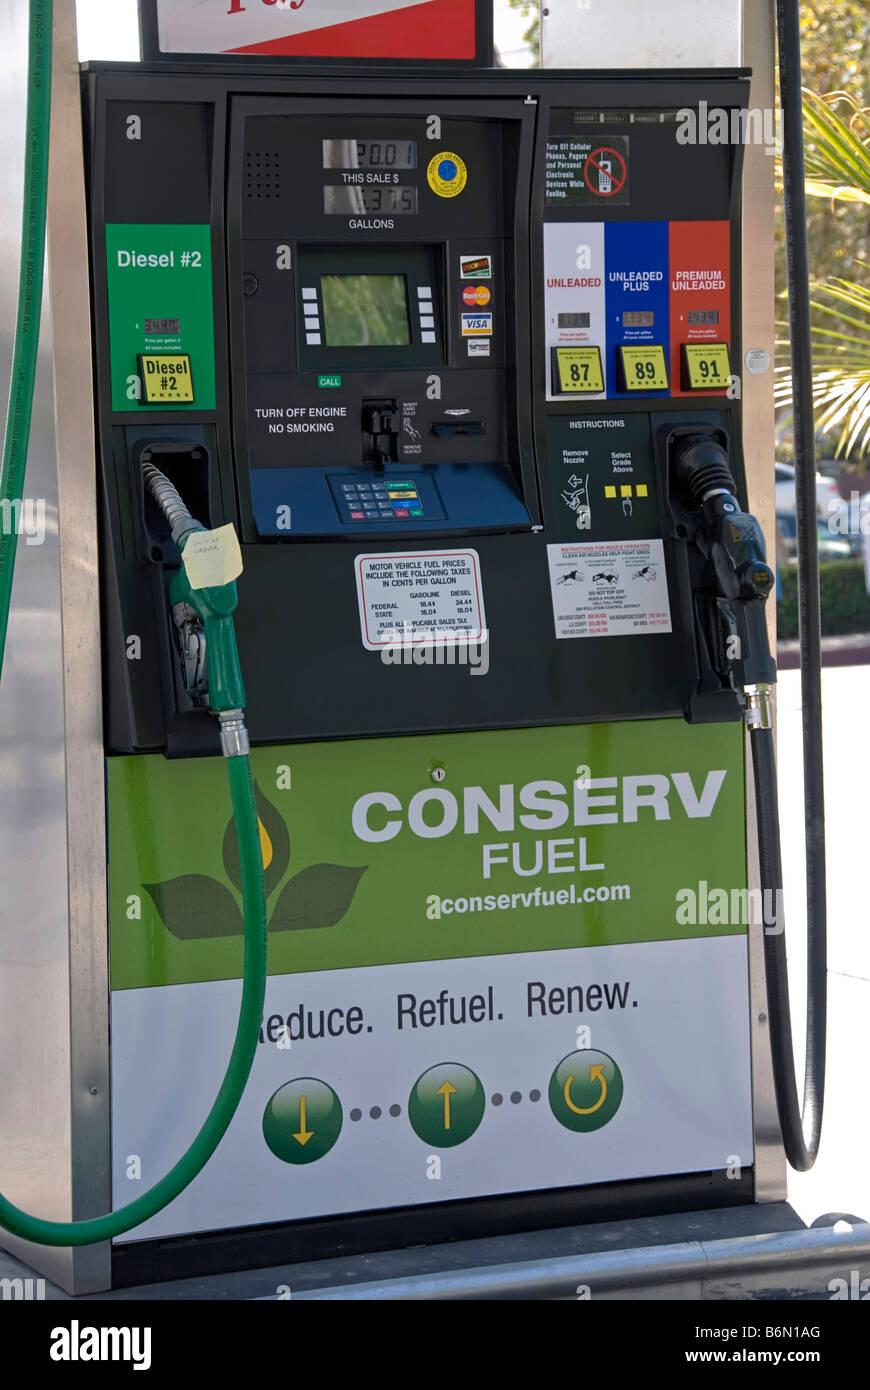 Diesel Gas Near Me >> Bio diesel fuel pump Conserv Gas Station Biodiesel Ethanol Los Stock Photo, Royalty Free Image ...